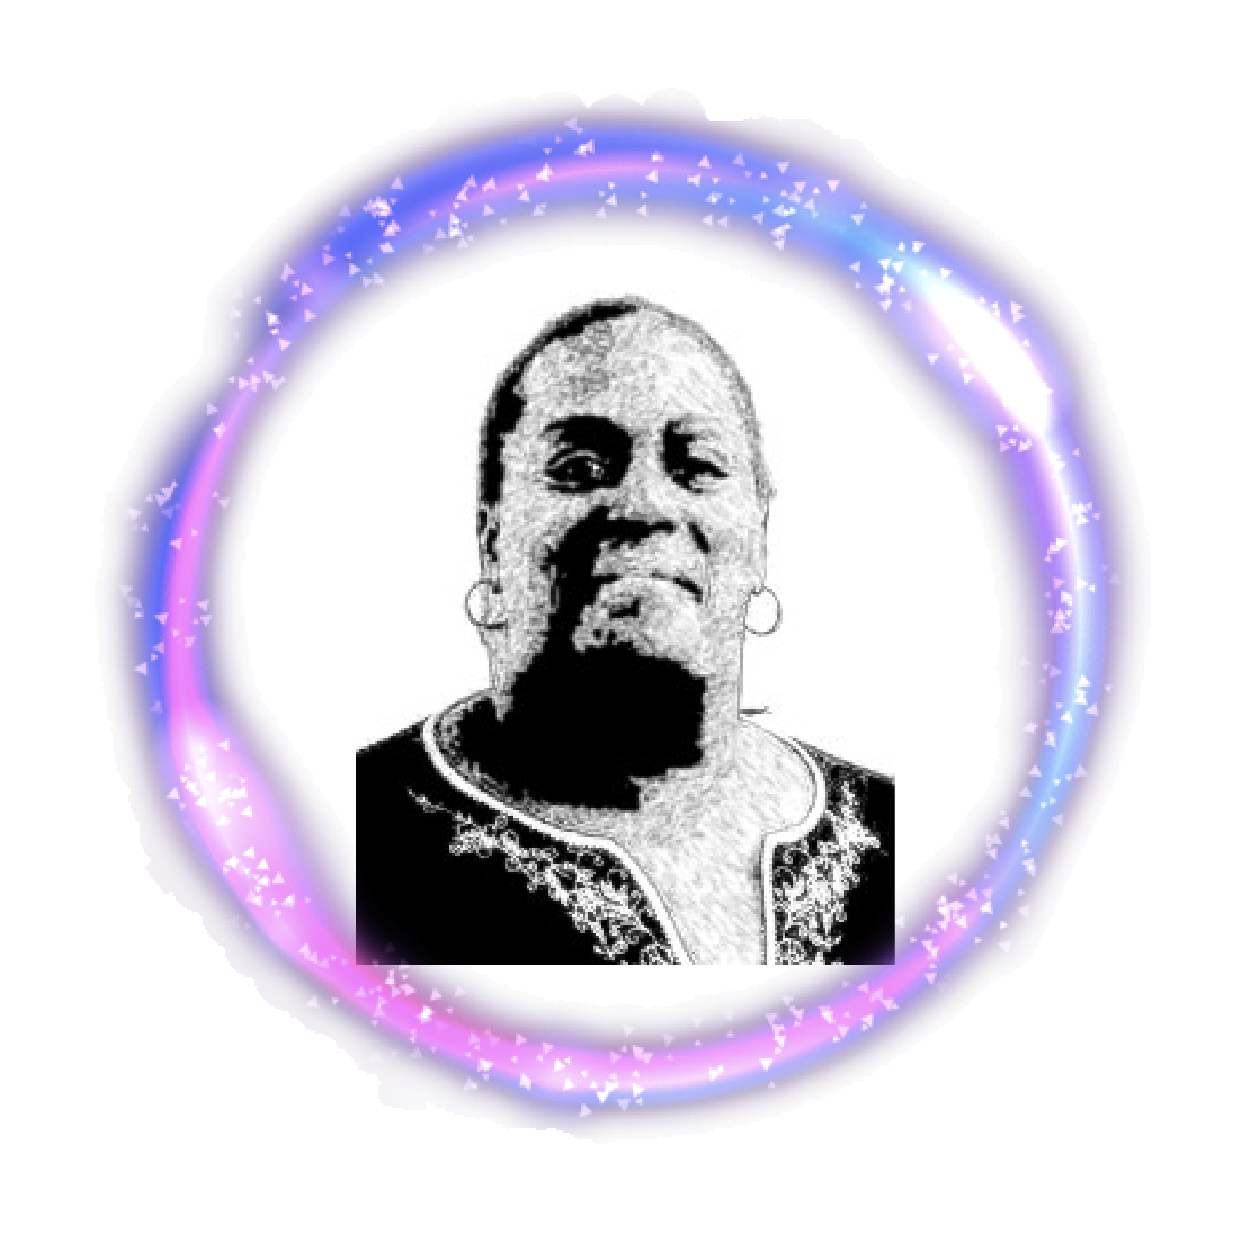 MINISTER BOBBIE JEAN BAKER MEMORIAL FUND - The Minister Bobbie Jean Baker Memorial Fundsupports the Minister Bobbie Jean Baker Memorial Award and the leadership of Transgender women of color.